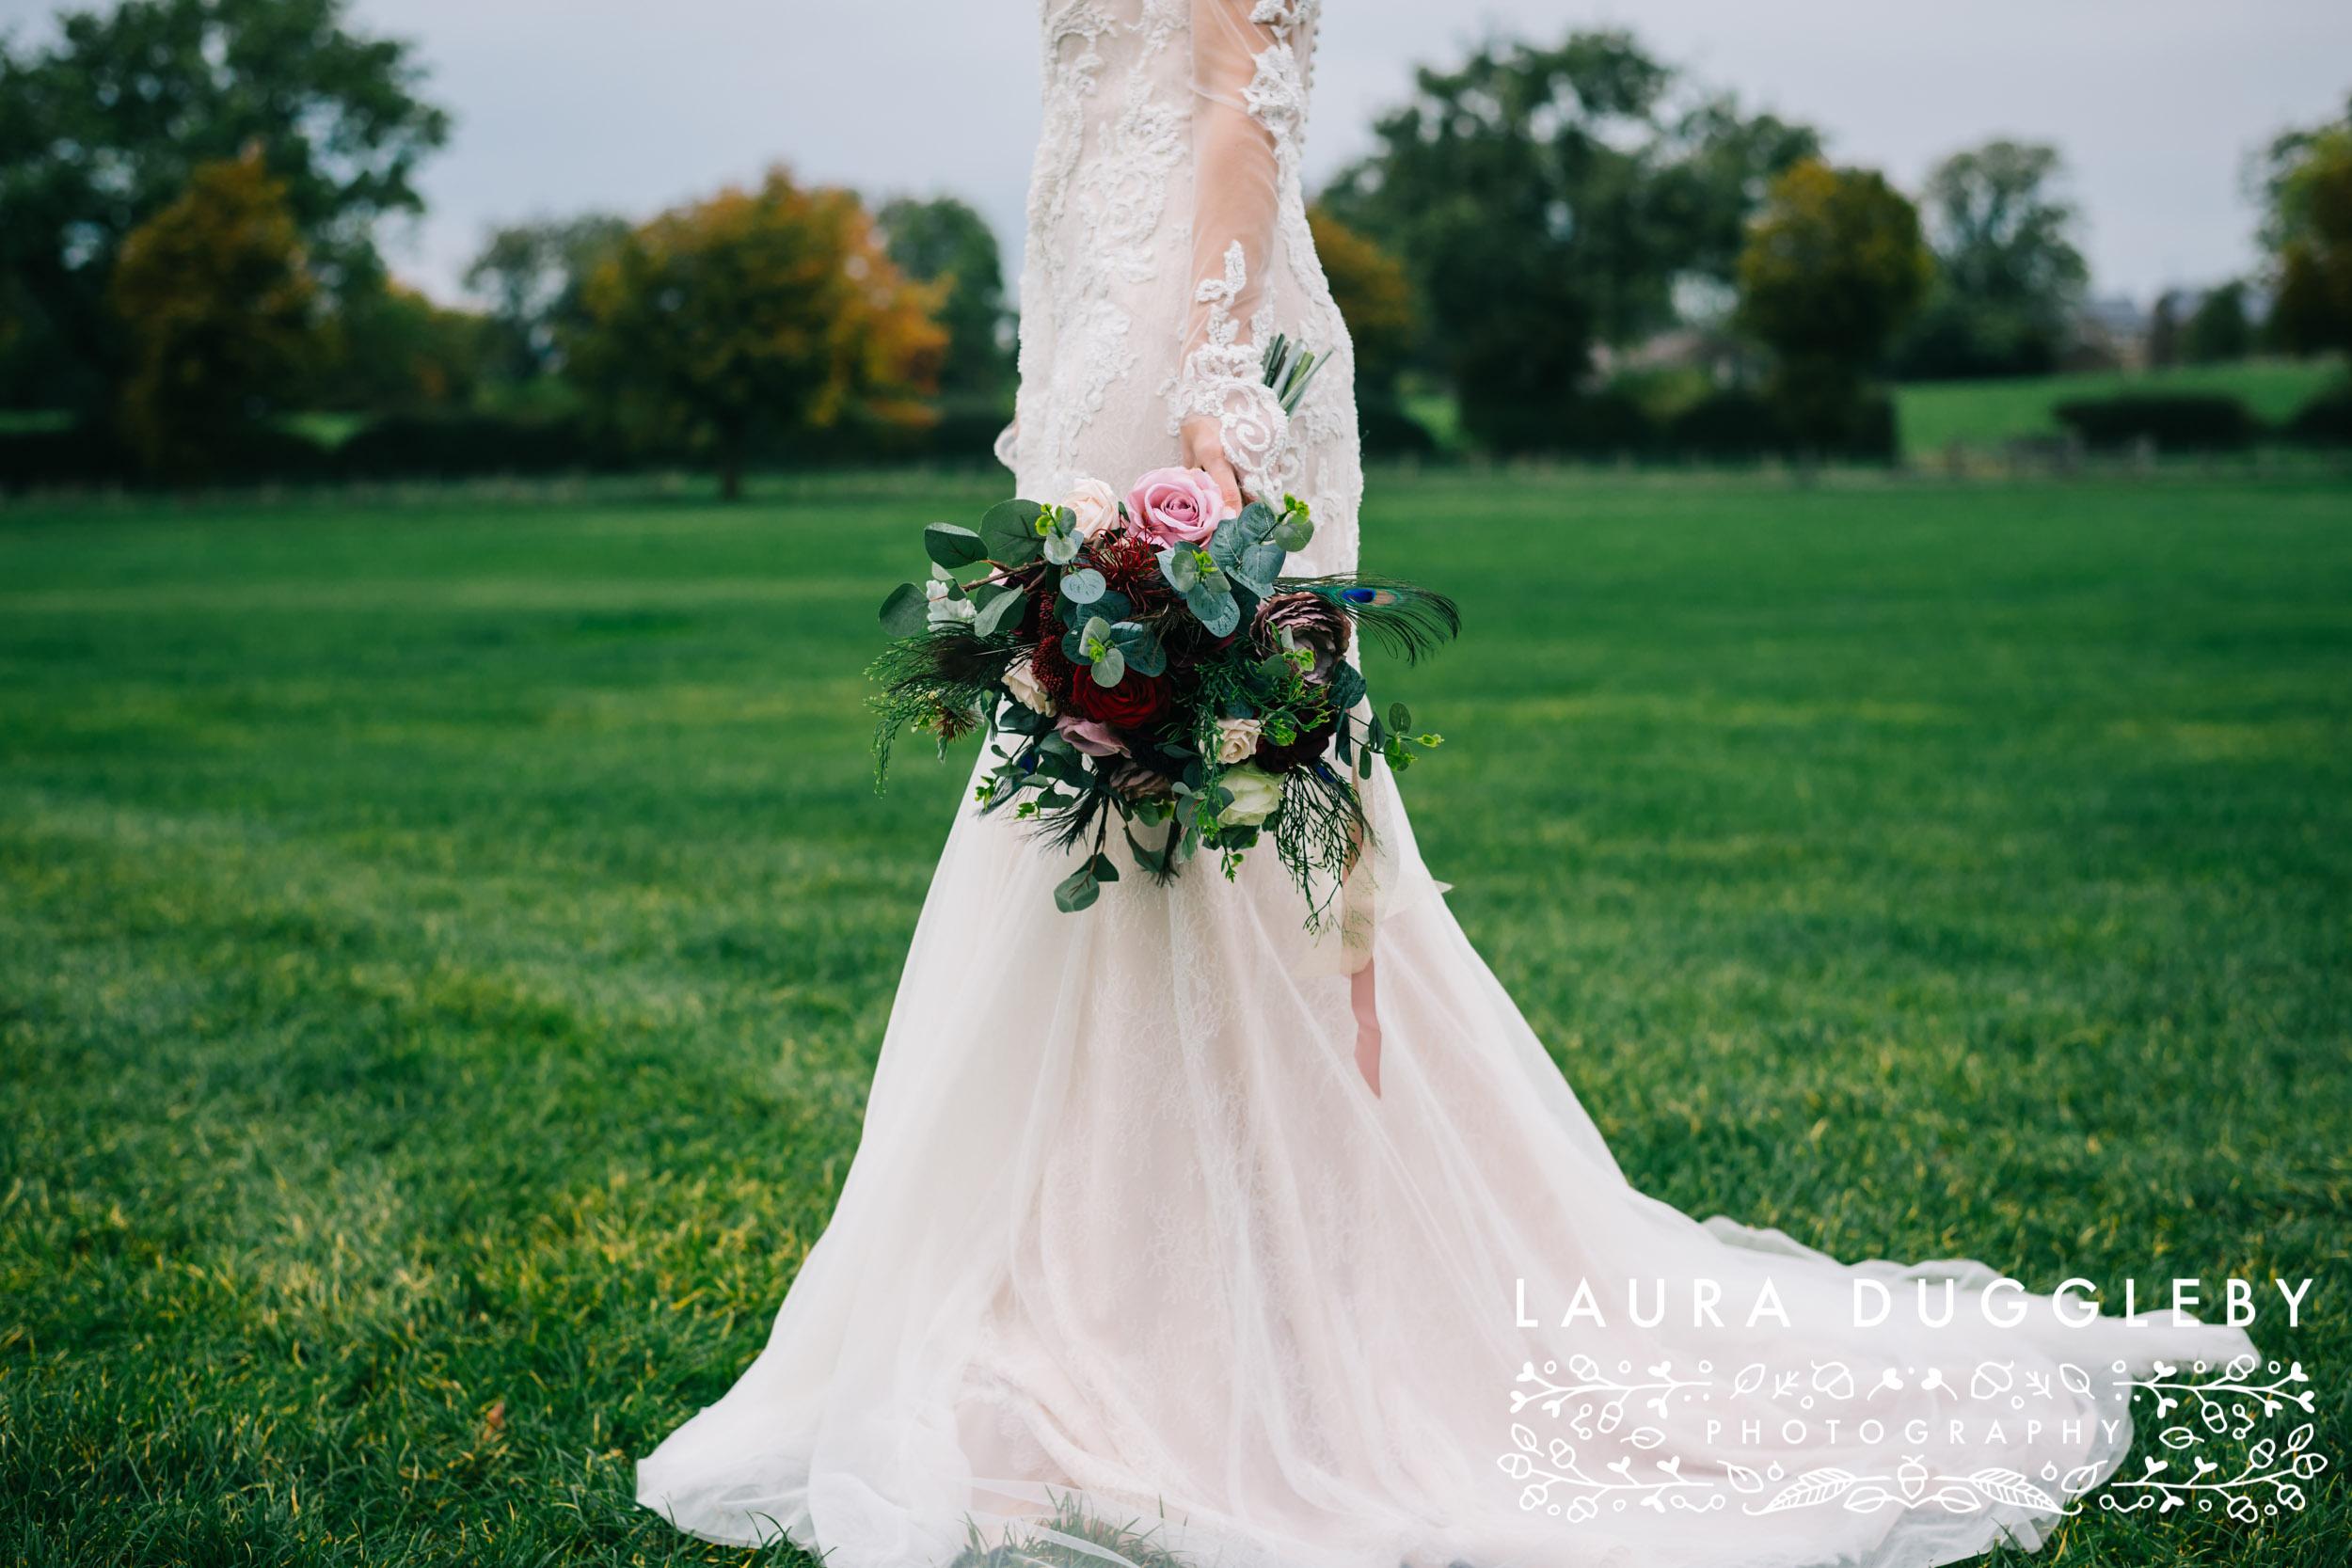 Skipton Wedding Photographer - Thornton Hall Country Park Wedding Photographer4